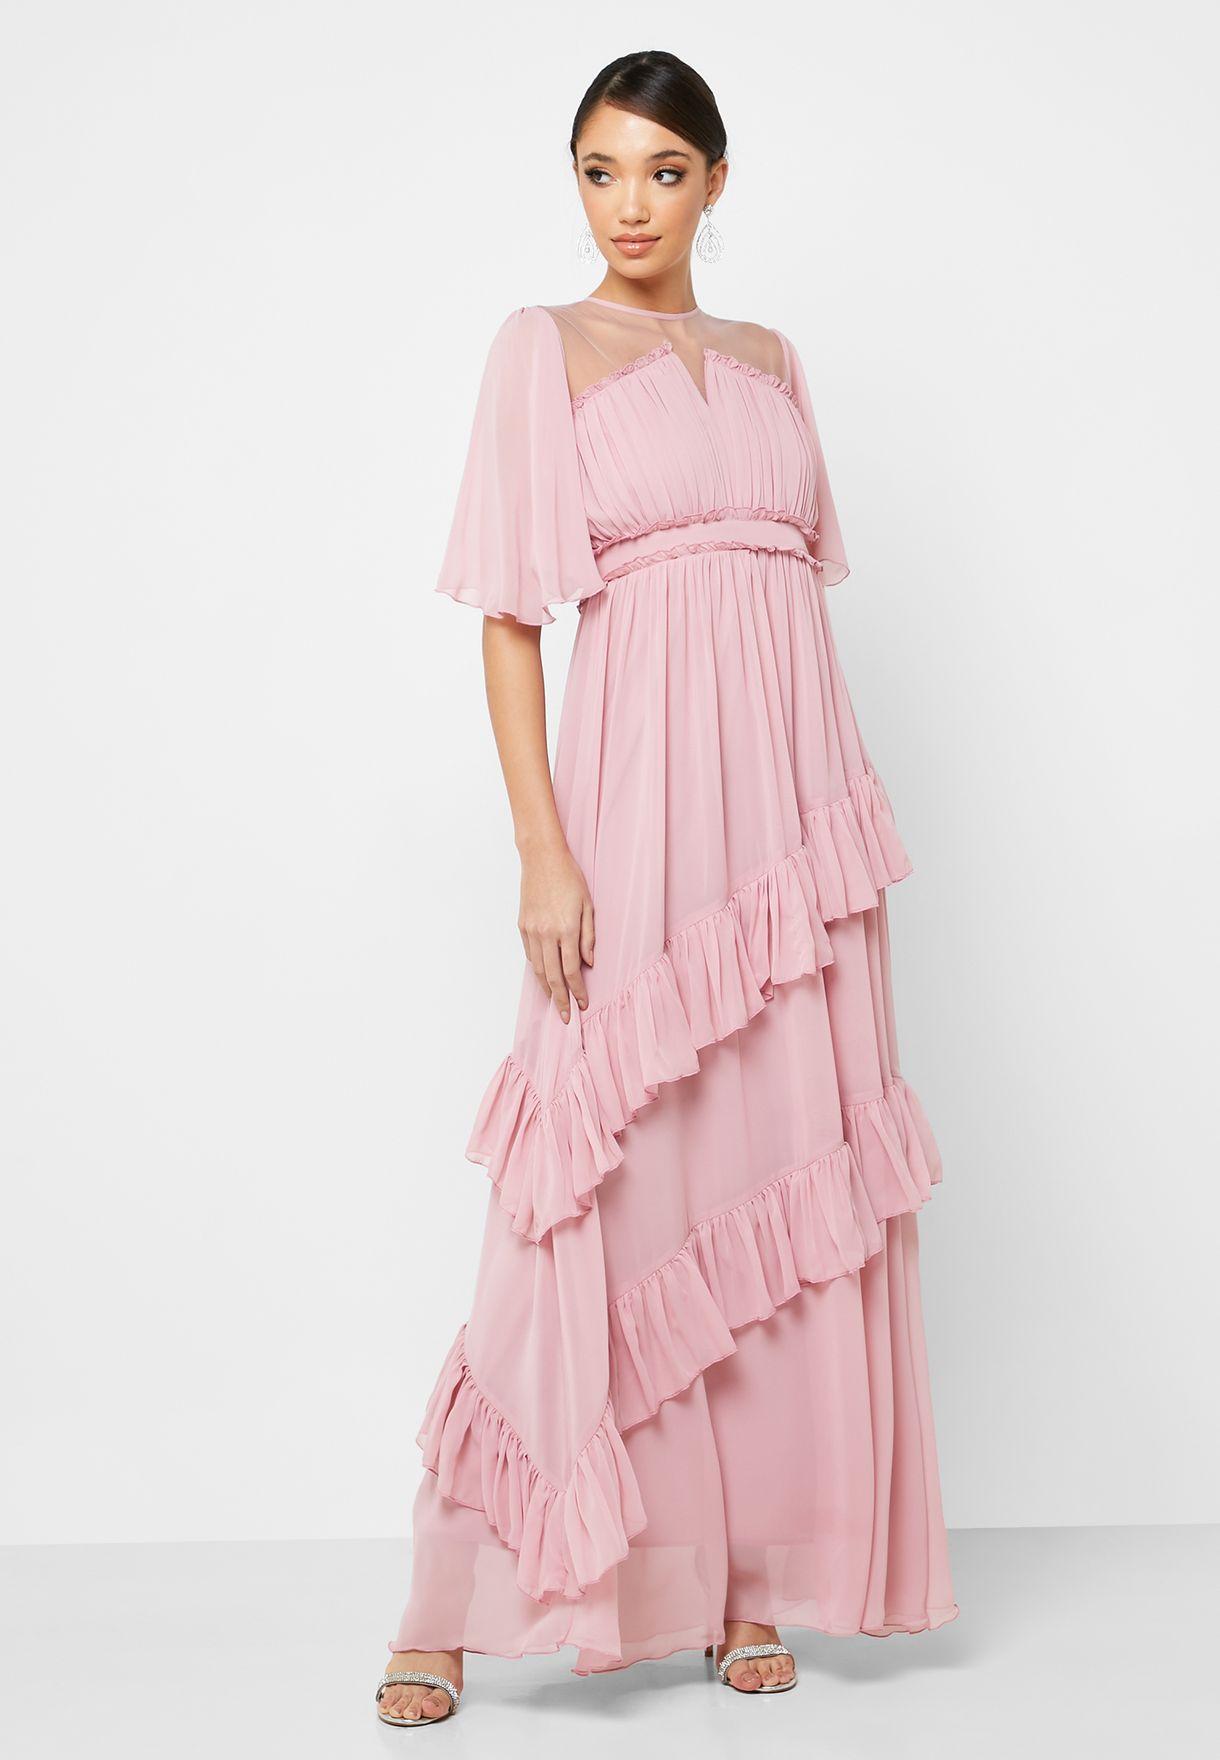 Tiered Ruffle Detail Maxi Dress